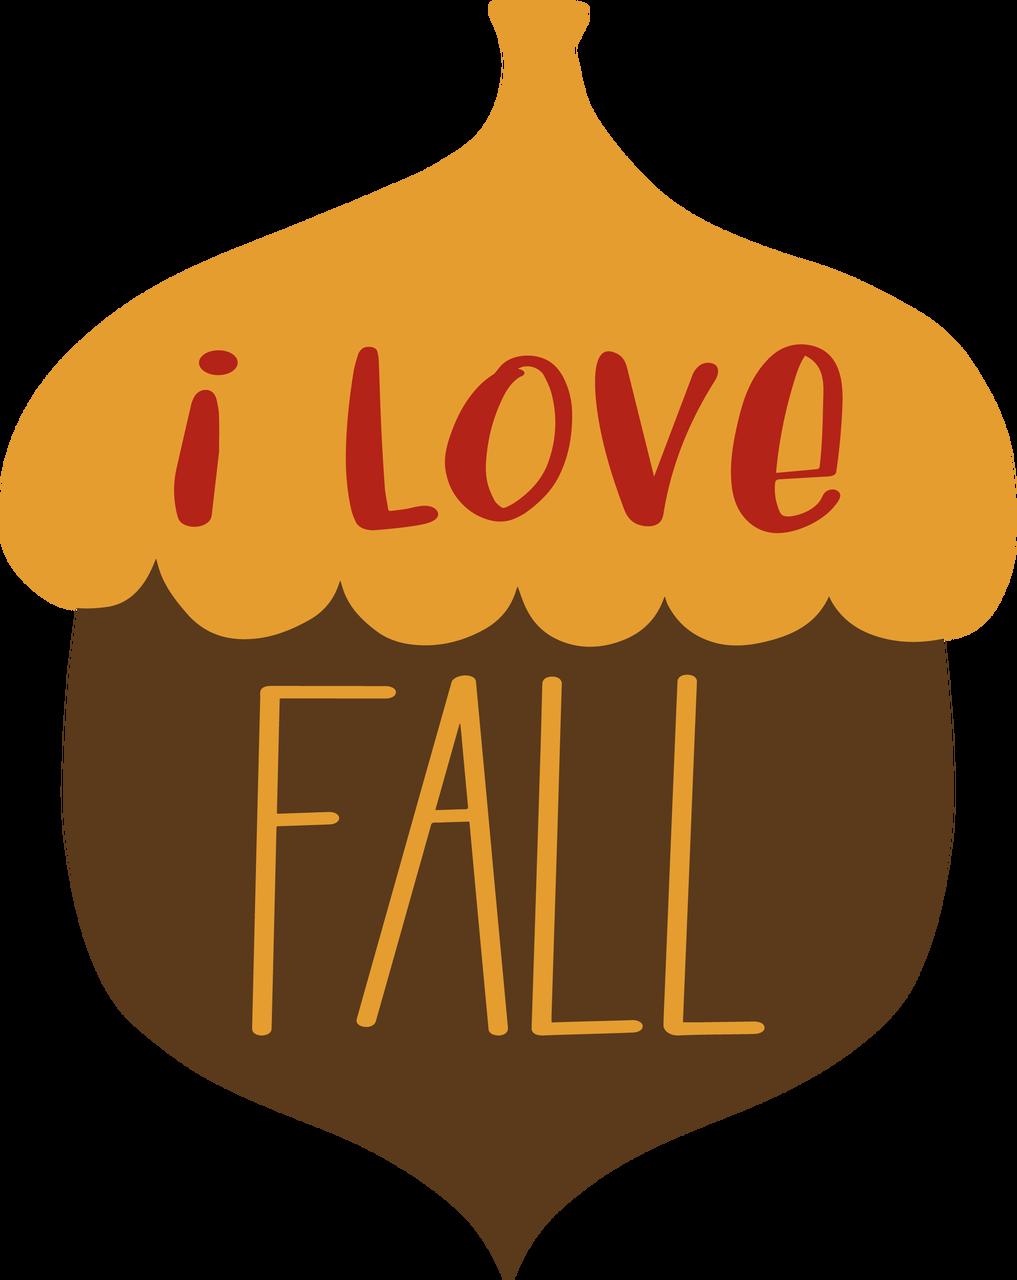 I Love Fall Acorn SVG Cut File